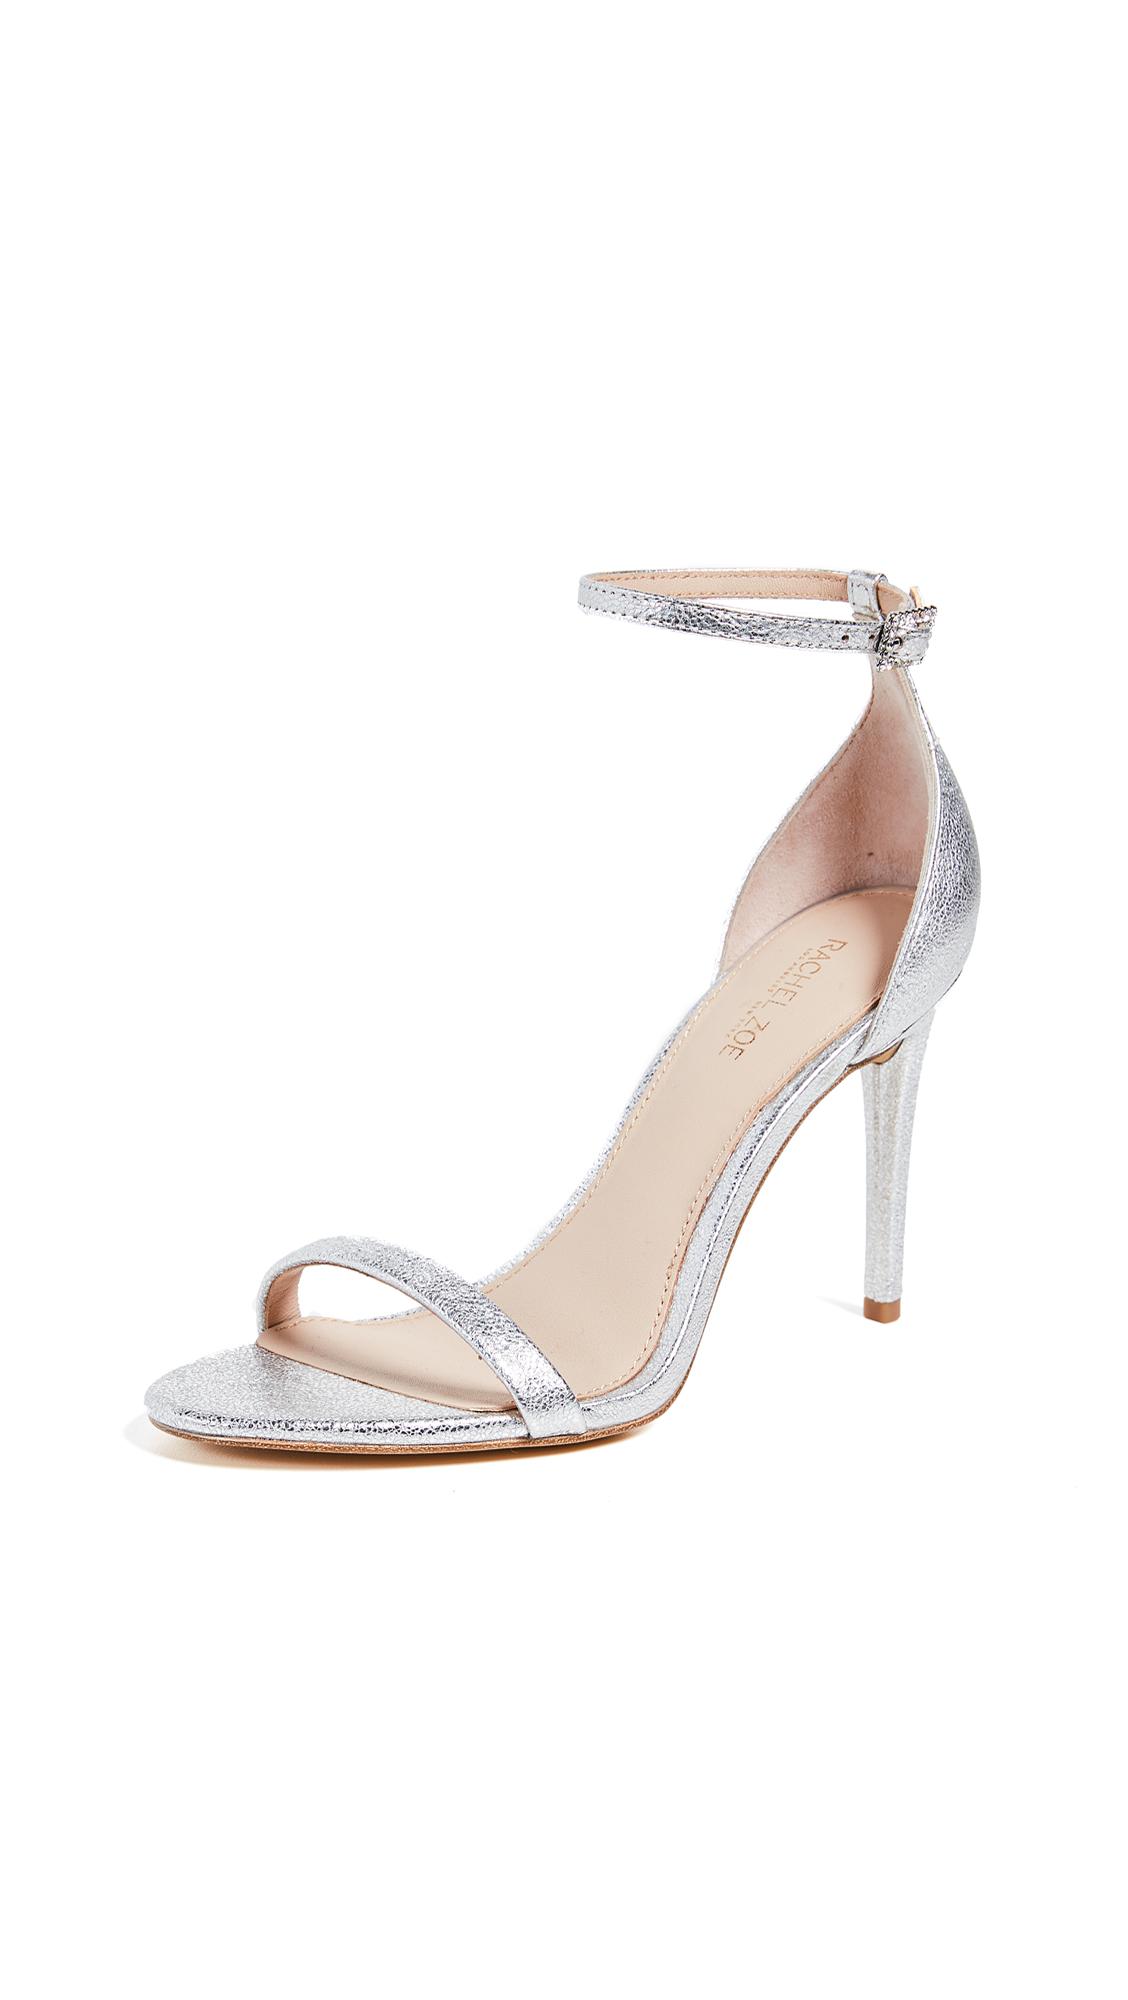 Rachel Zoe Ema Crystal Sandals - Silver